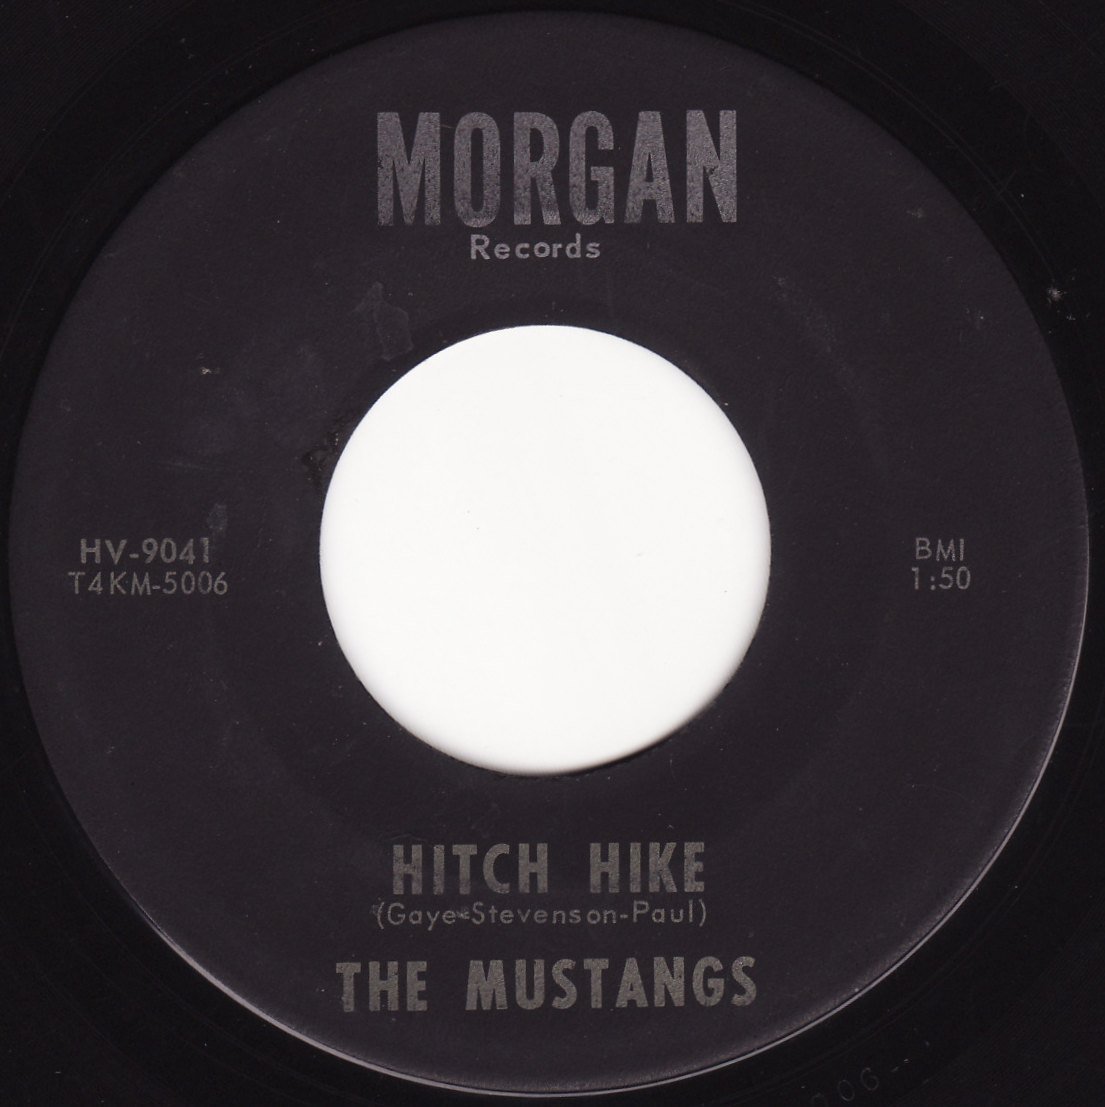 Artyfacts In Wax The Mustangs Morgan